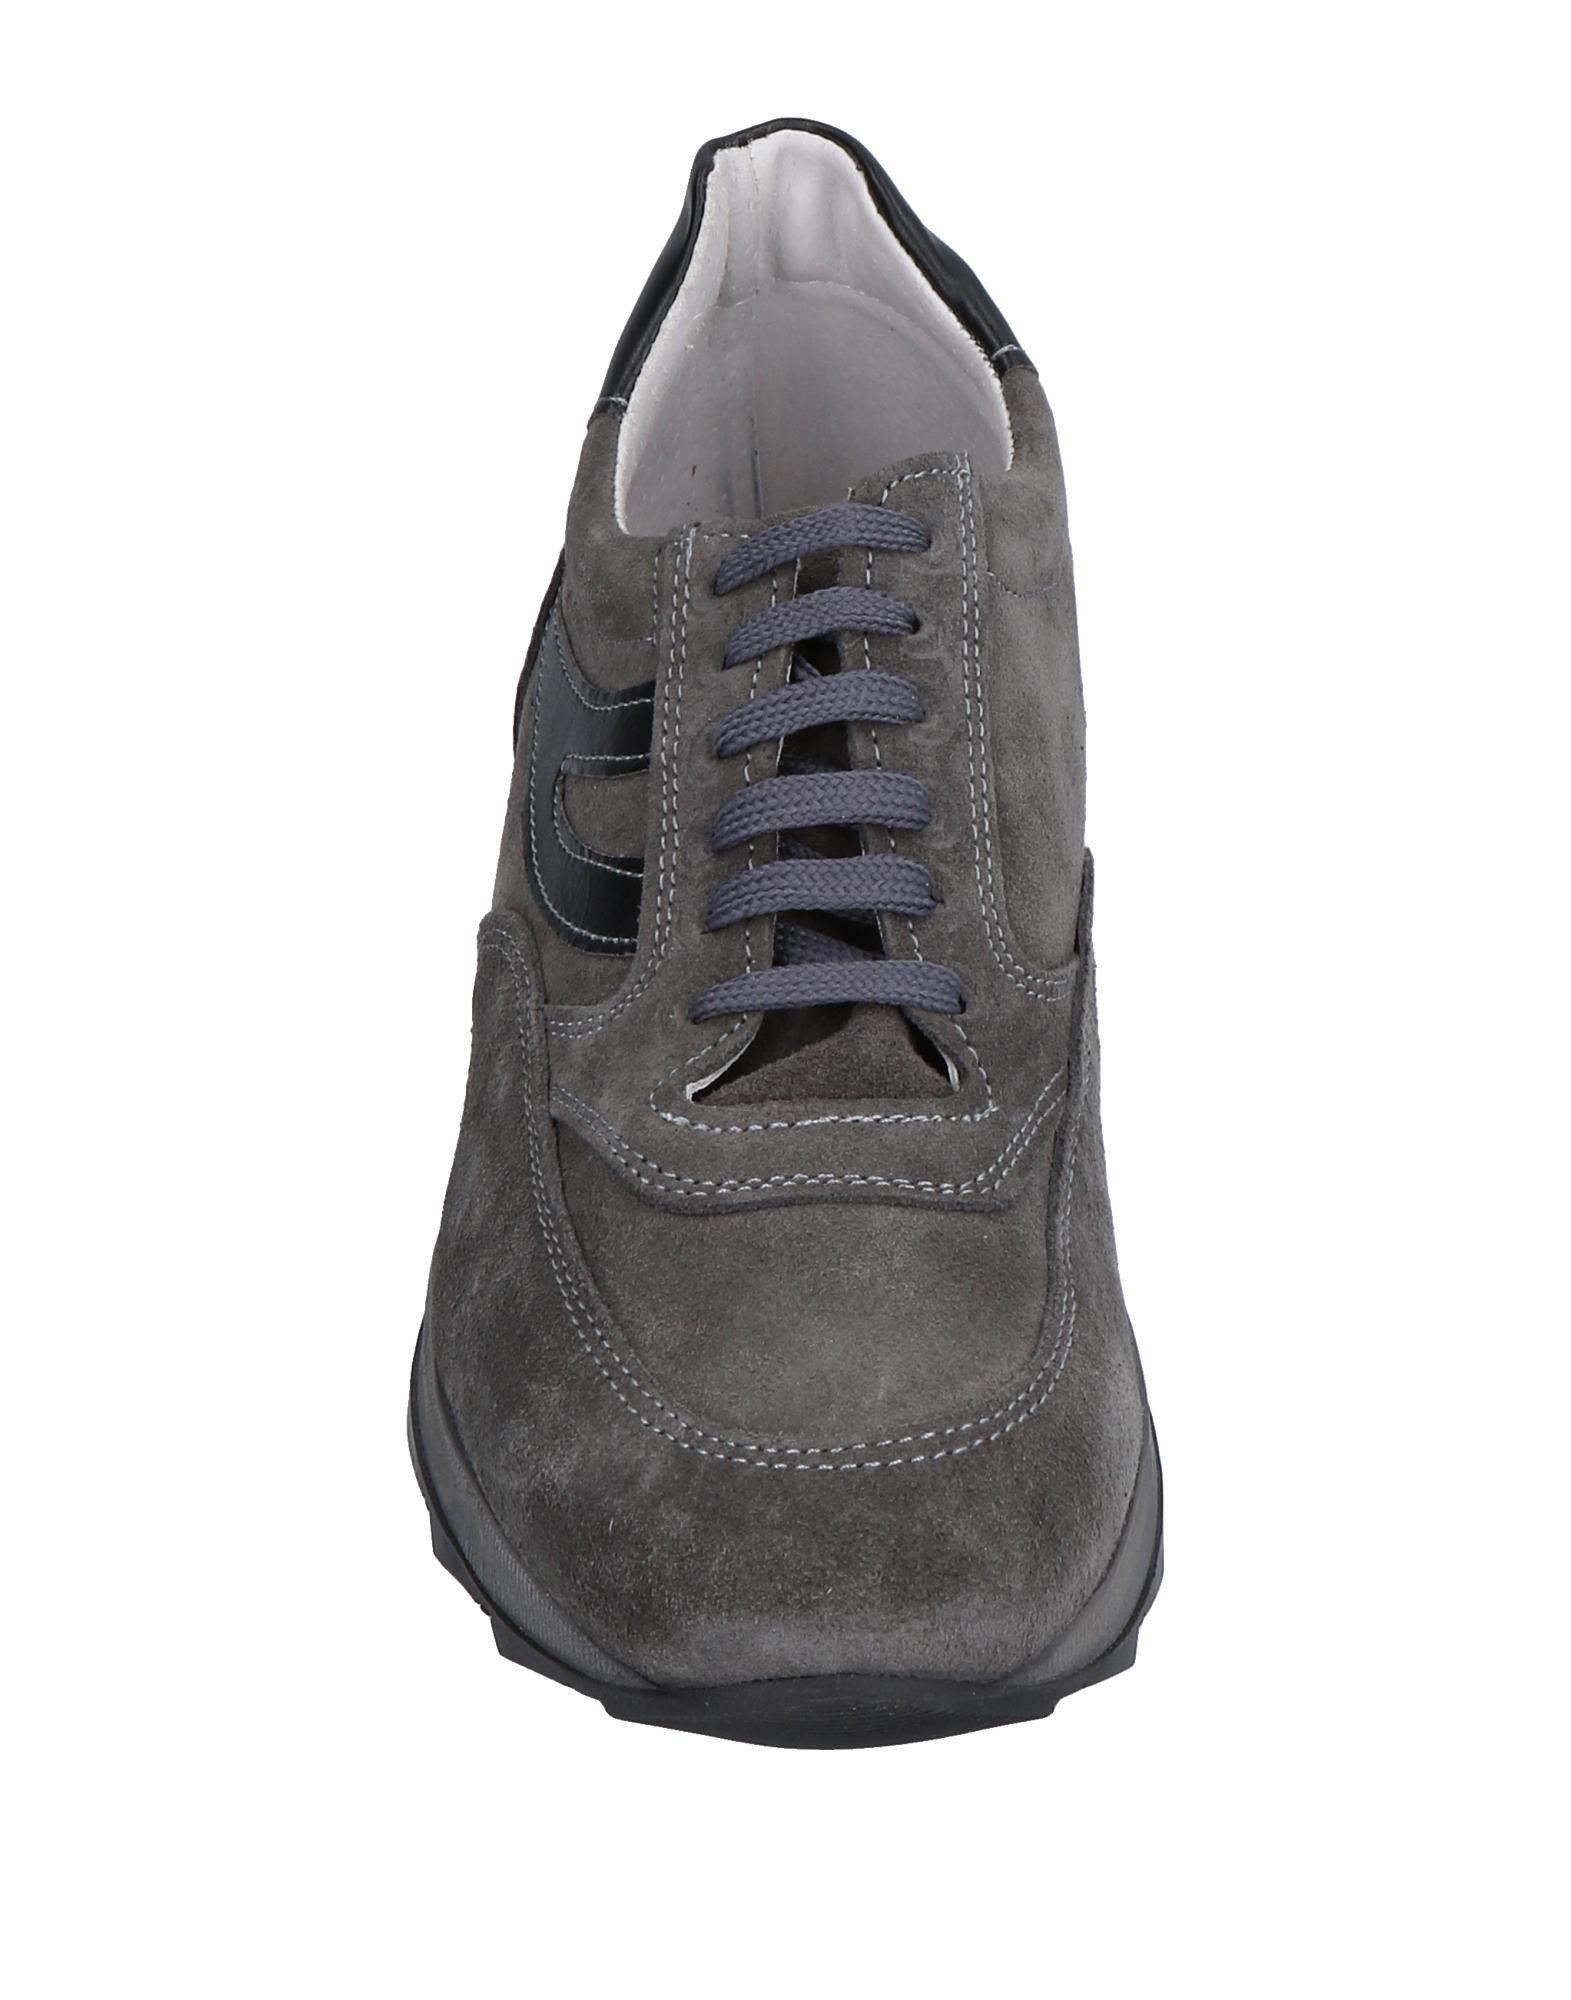 Rabatt echte  Schuhe Cafènoir Sneakers Herren  echte 11515617BD f4f0ac